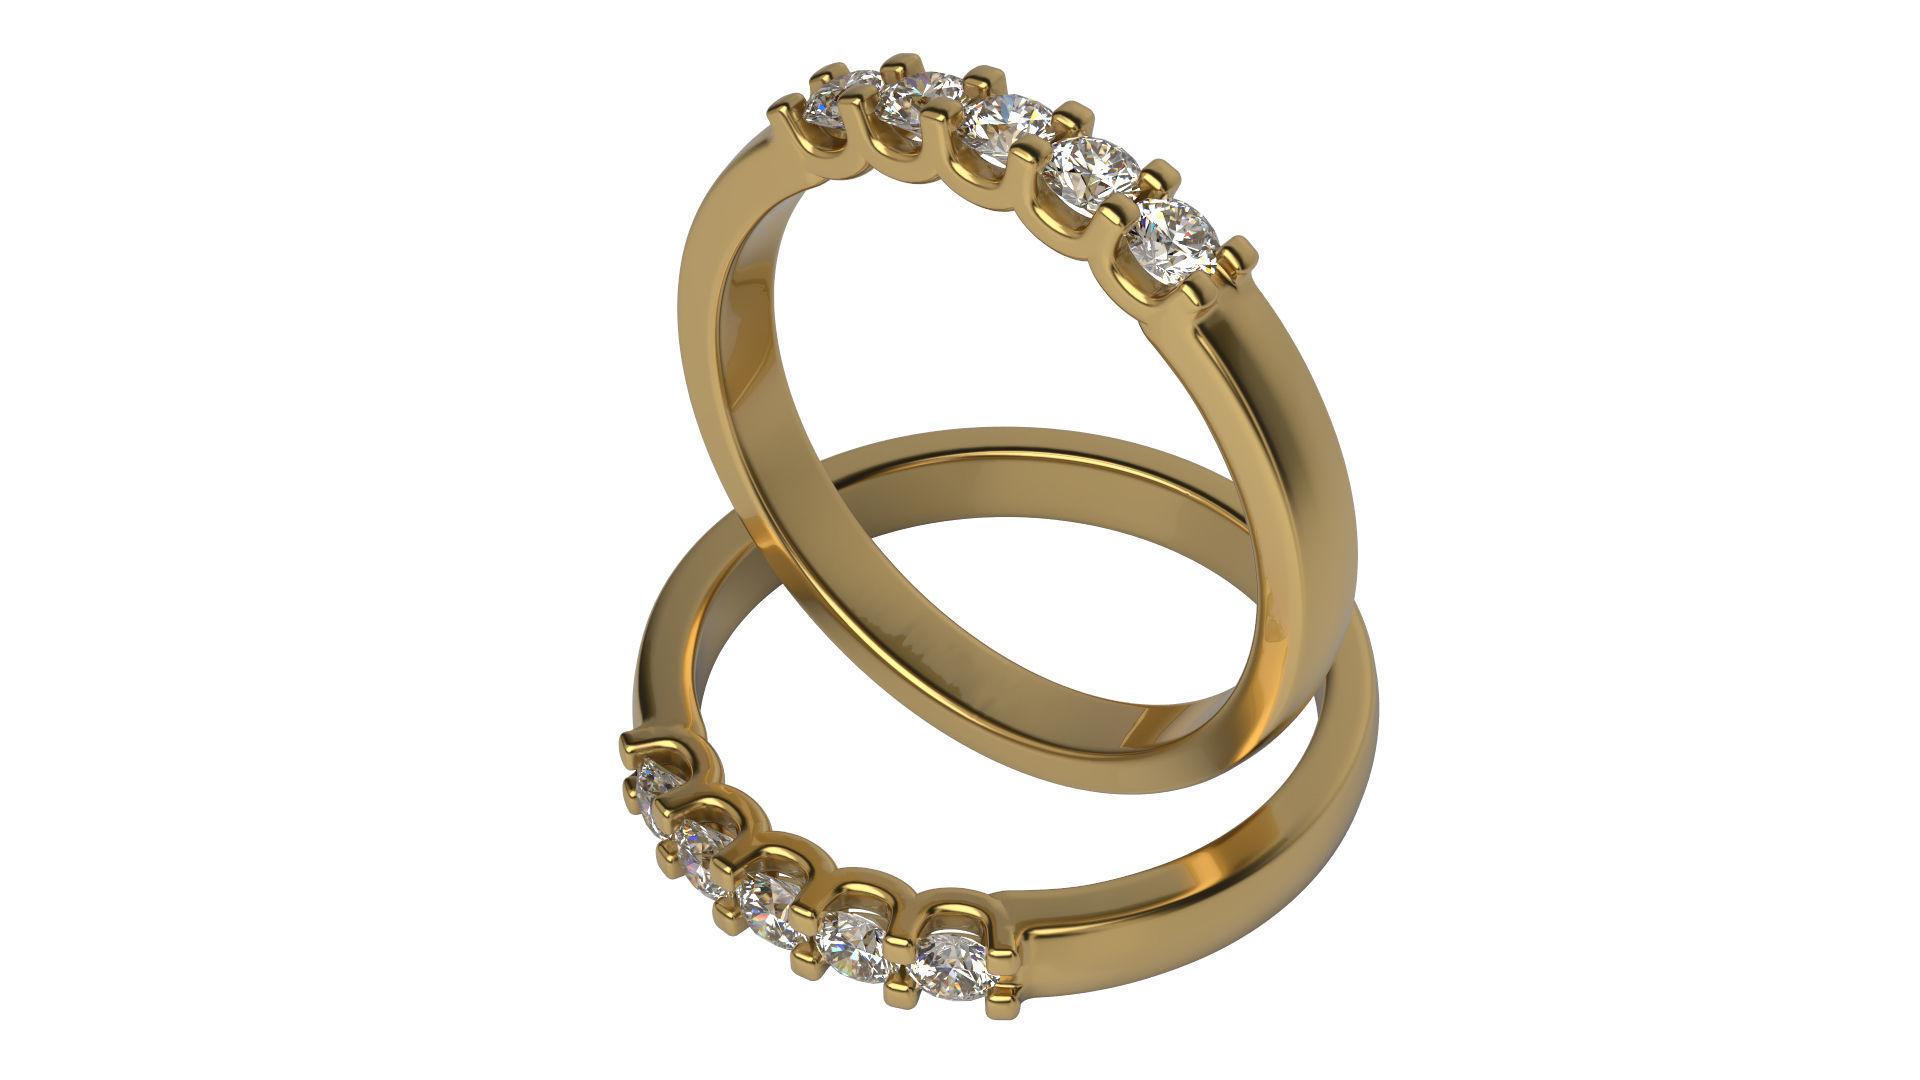 5 Diamond ring  Size 5-10